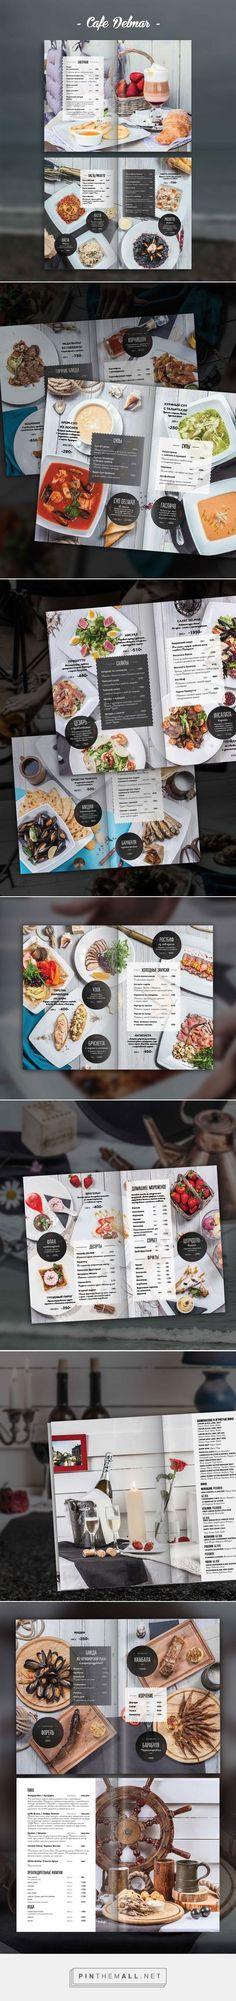 Photo & menu design for restaurant on Behance  https://www.behance.net/gallery/40268491/Photo-menu-design-for-restaurant - created via https://pinthemall.net